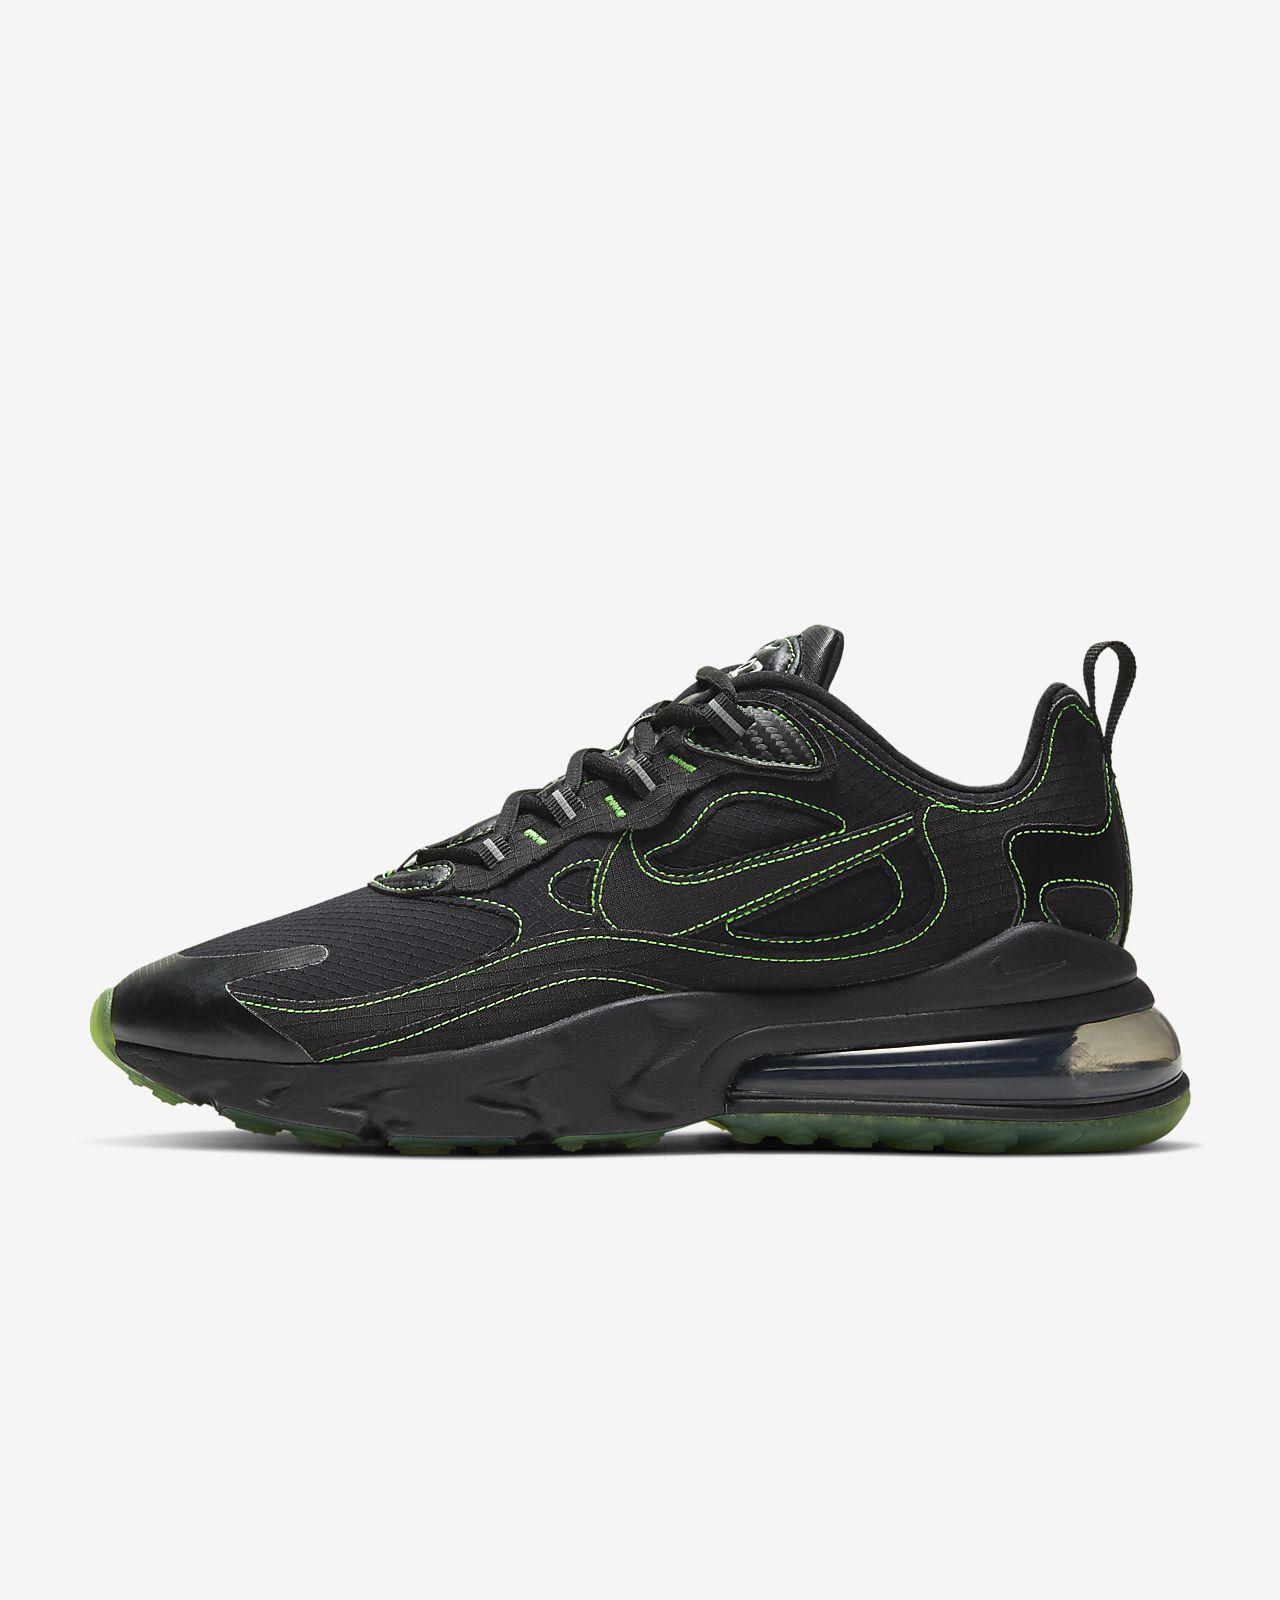 Nike Air Max 270 Special Edition-sko